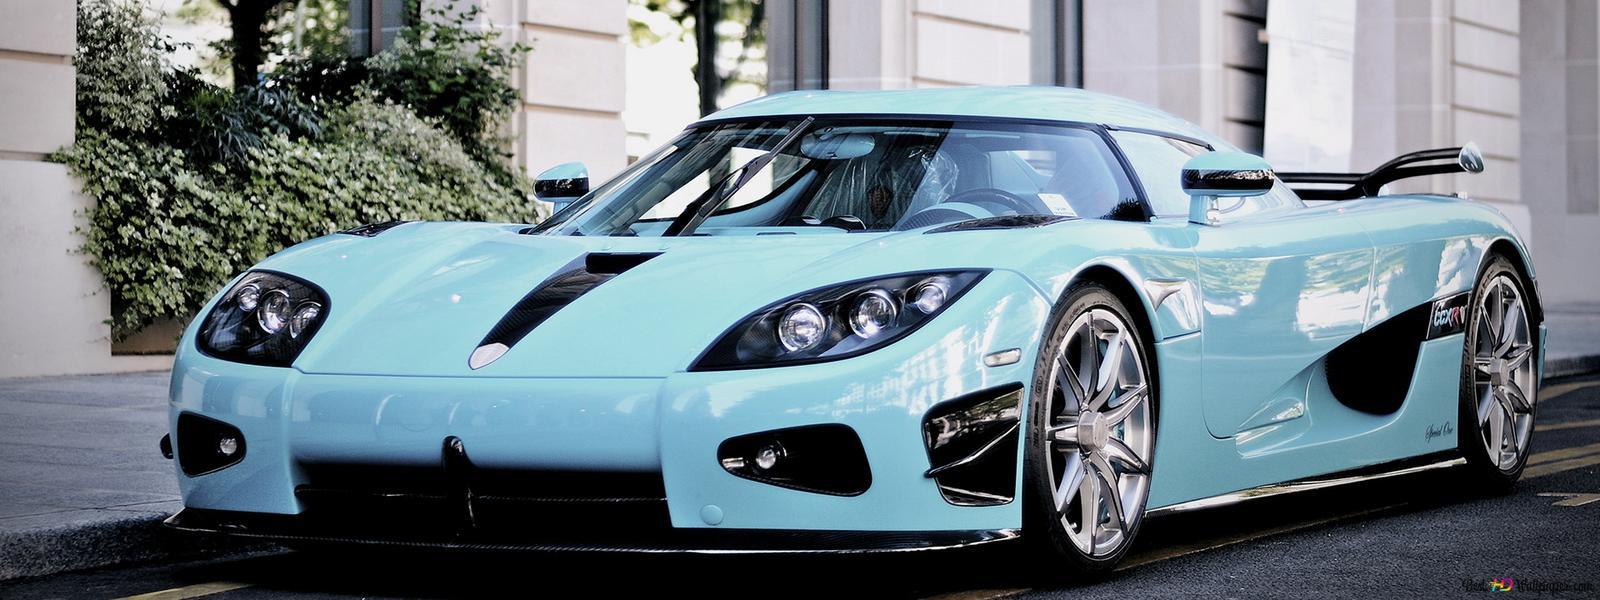 Koenigsegg Agera Sport Car Hd Wallpaper Download